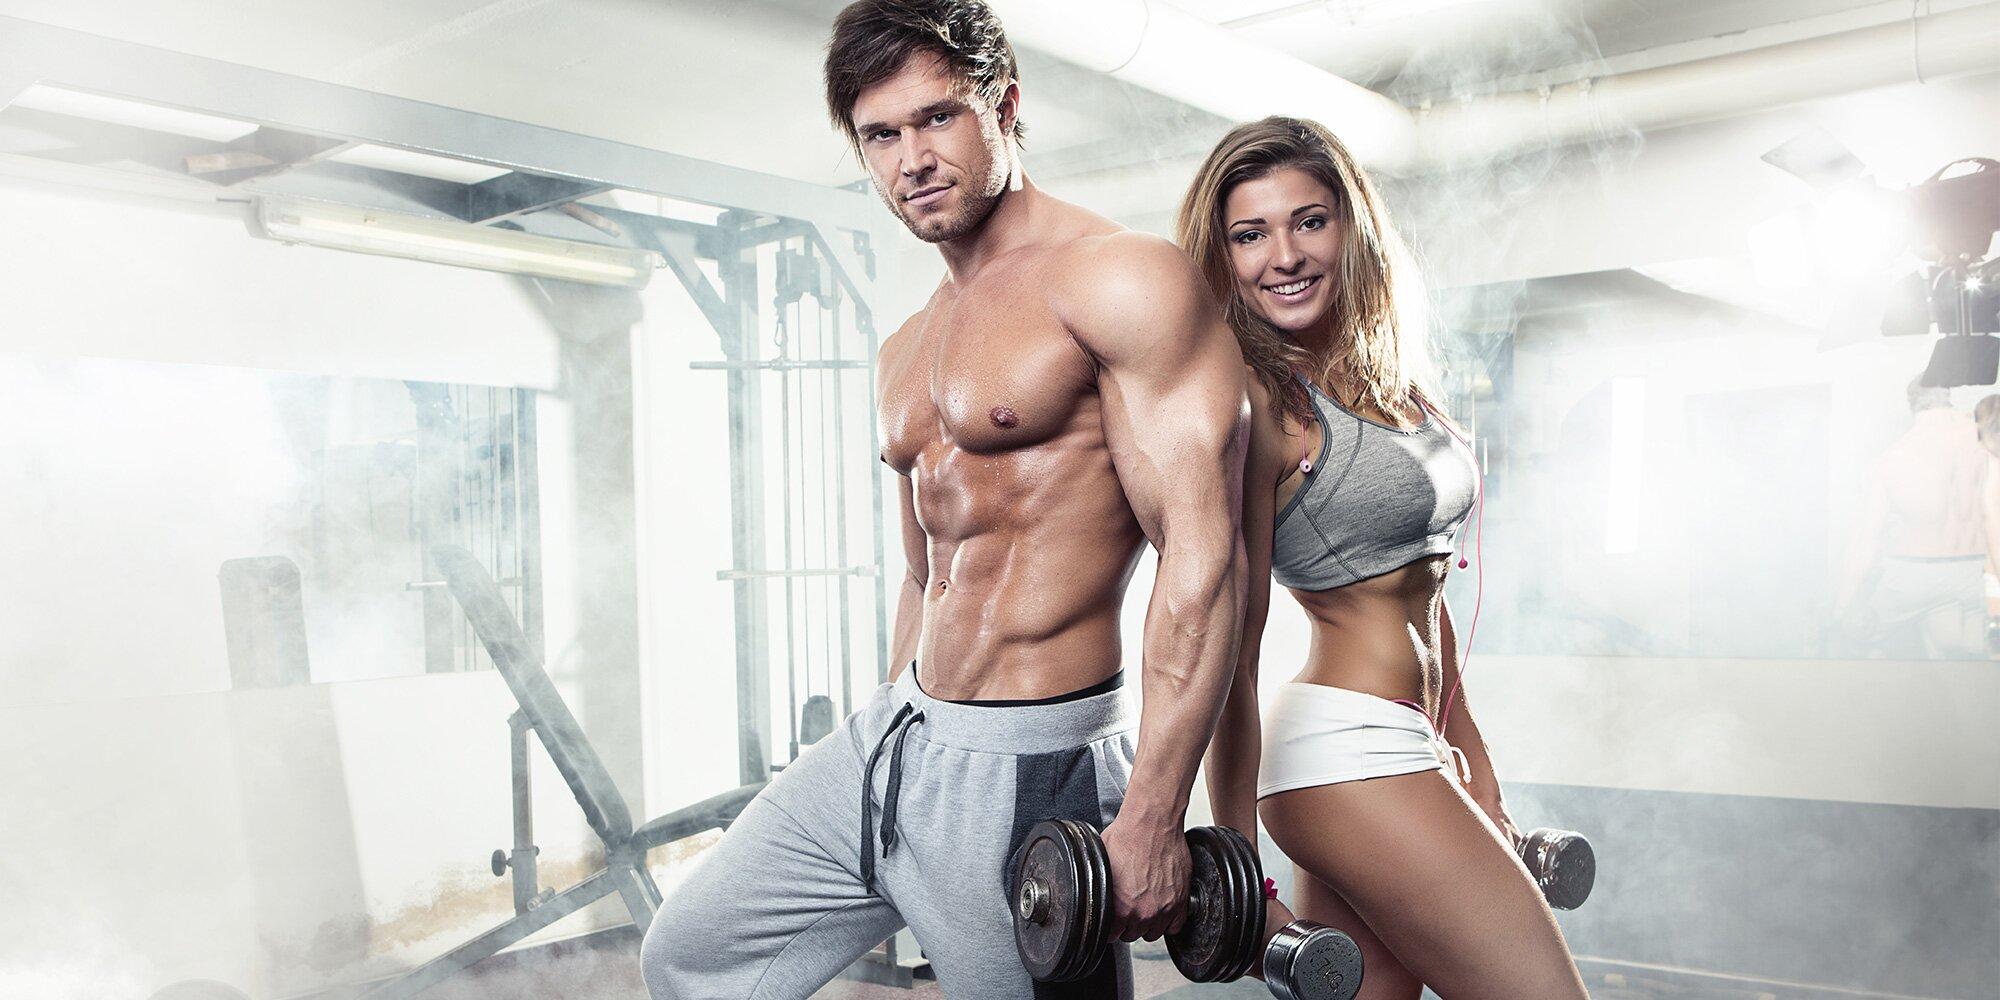 фитнес девушки борются с мужчинами шоу фото